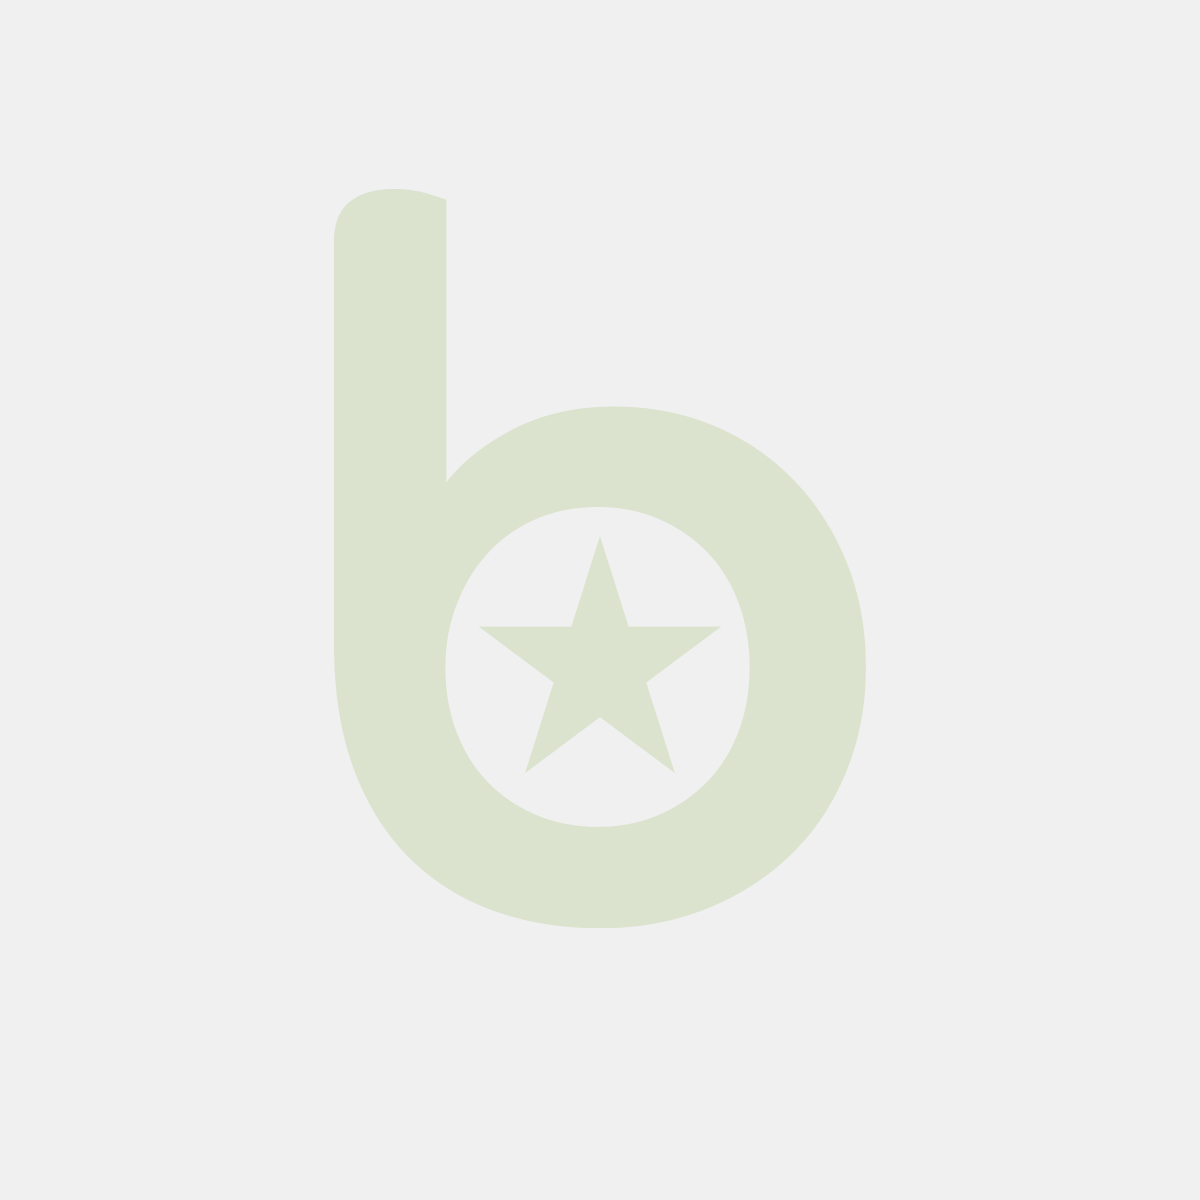 Taca prostokątna 53 x 32 x 1,5cm GN1/1 czarna z melaminy